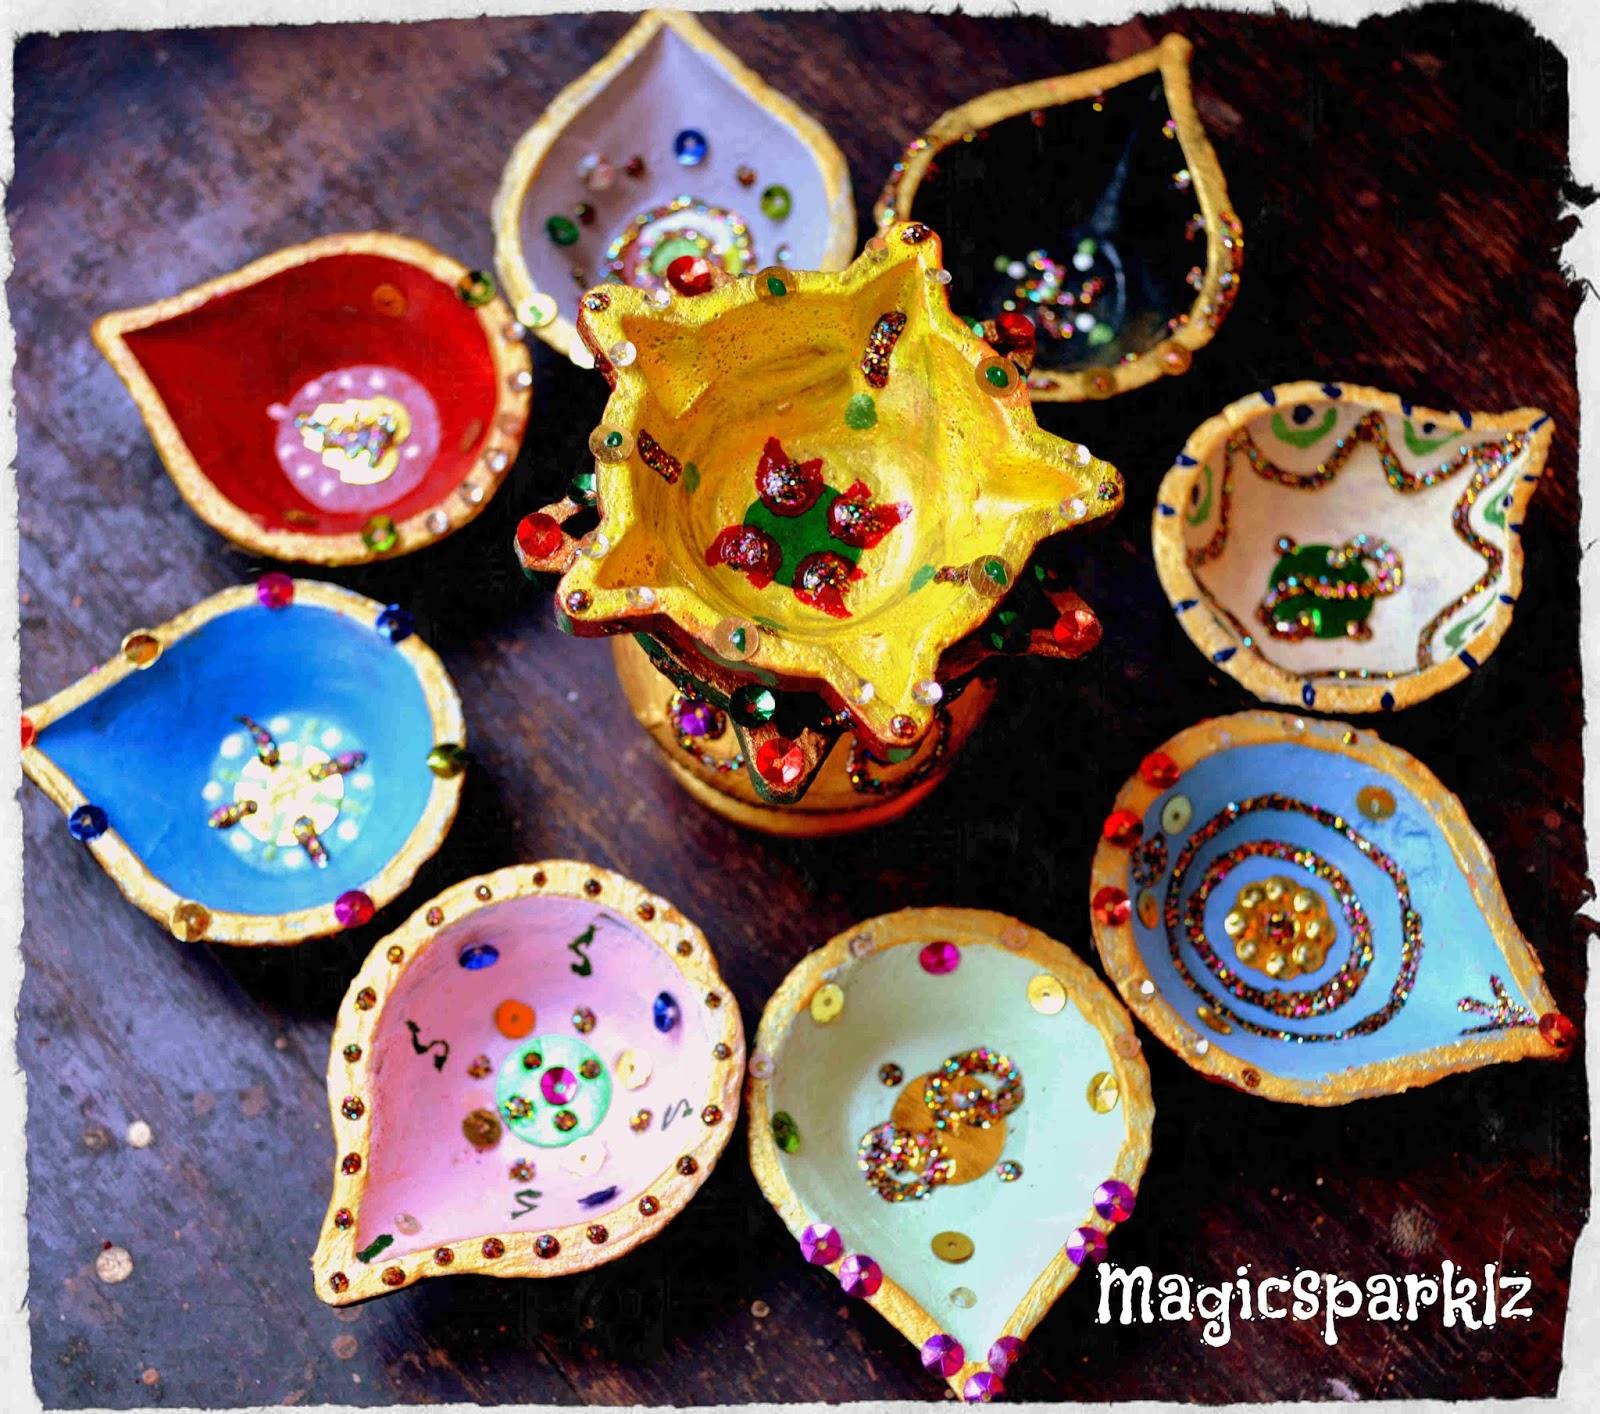 Magic Sparklz Decorative Diyas